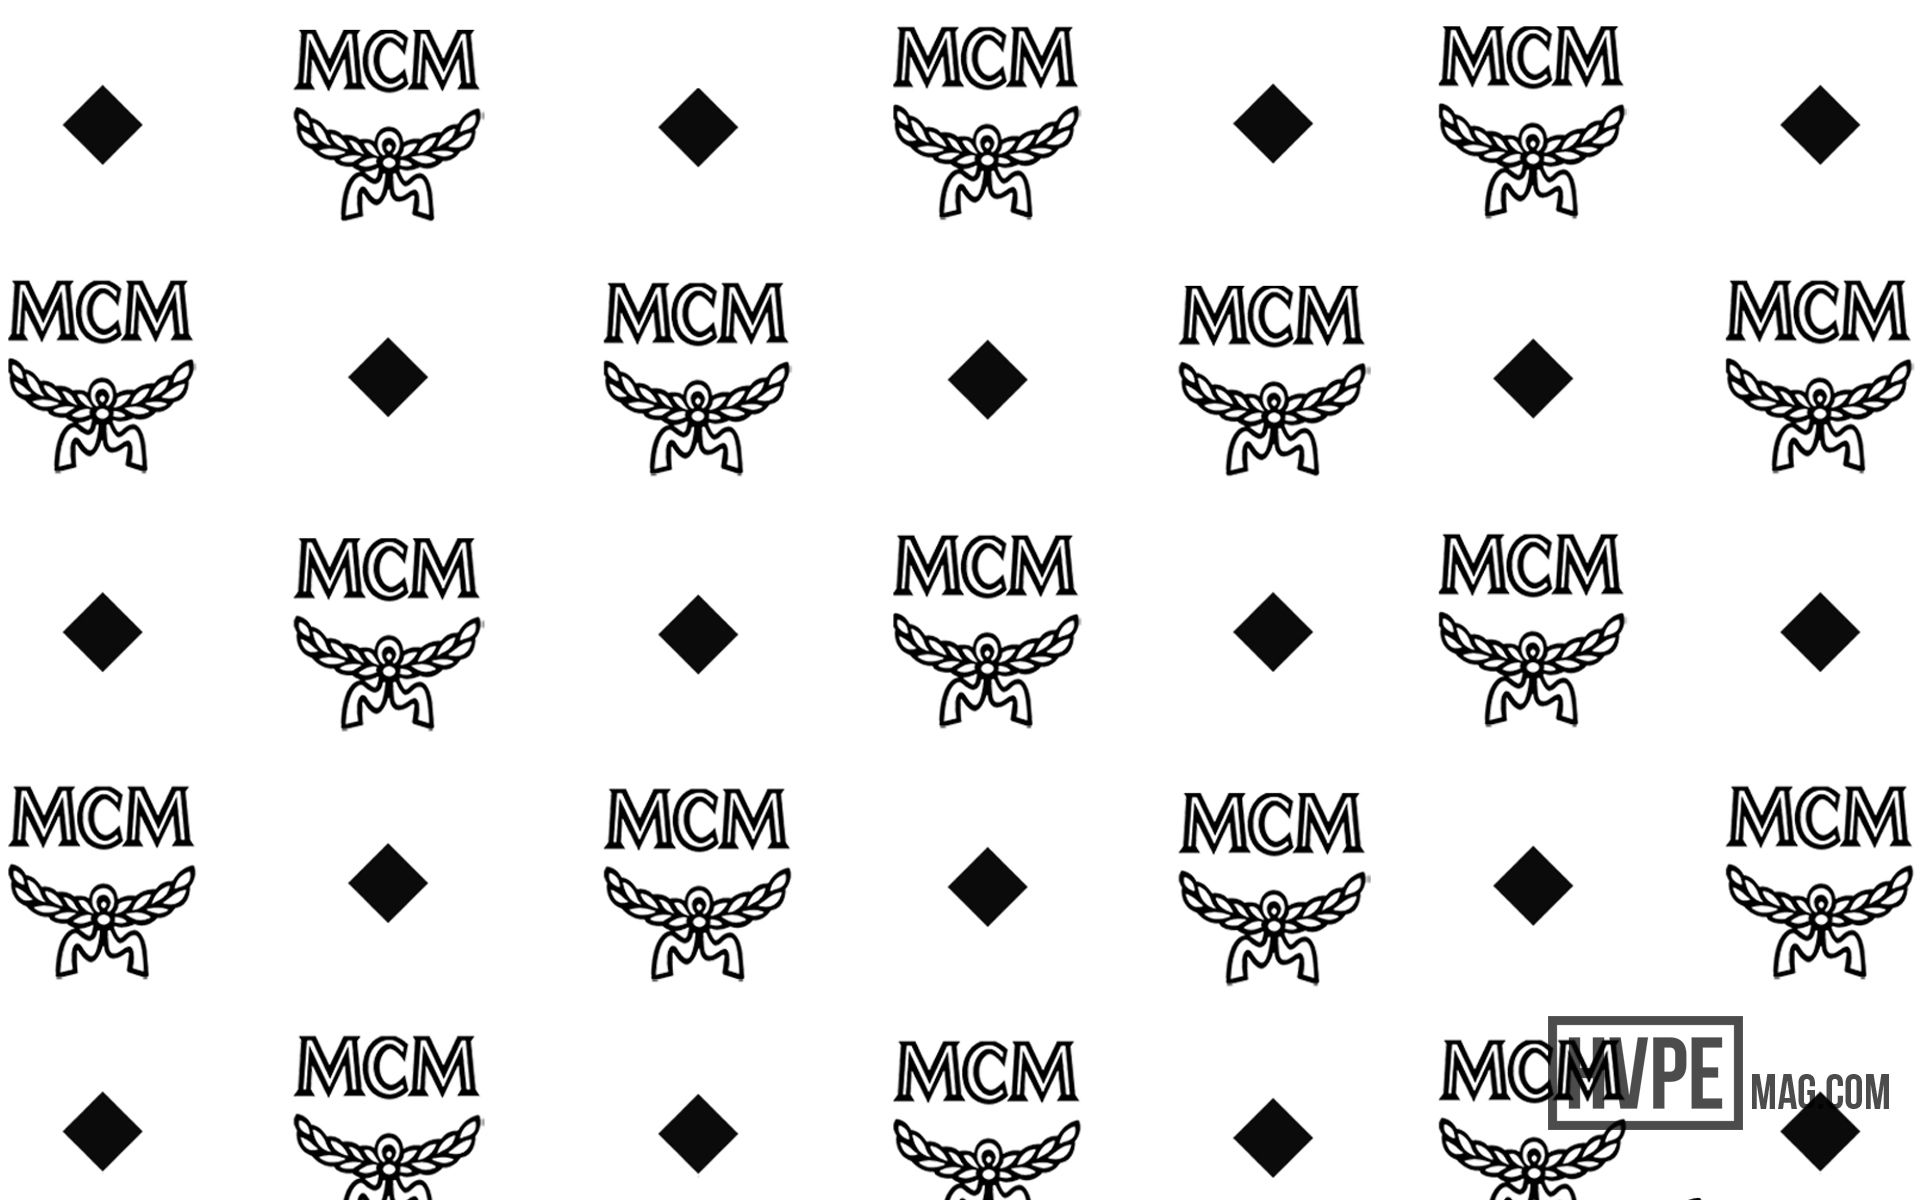 Mcm 4 Hvpe Mcm Stencils Stencil Printing